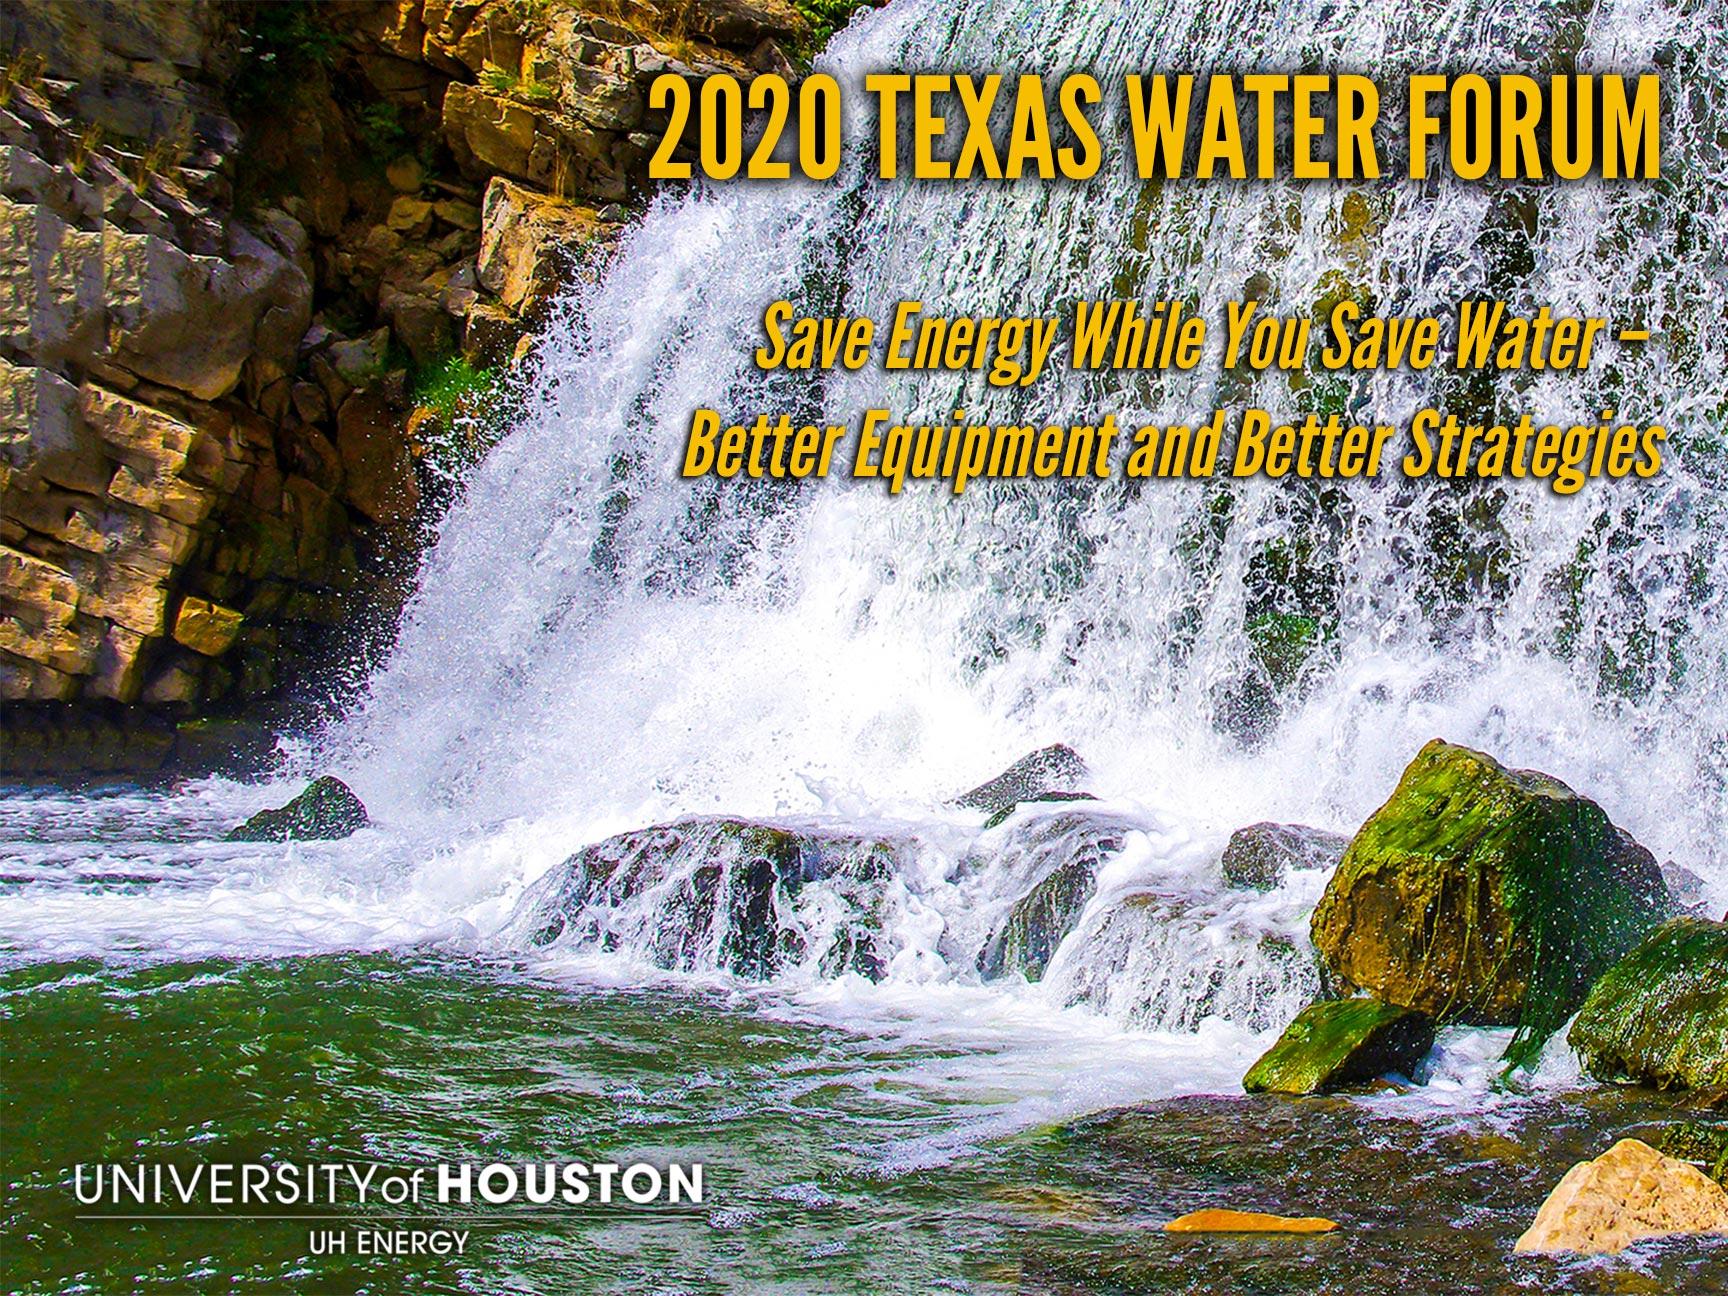 2020 TEXAS WATER FORUM Image